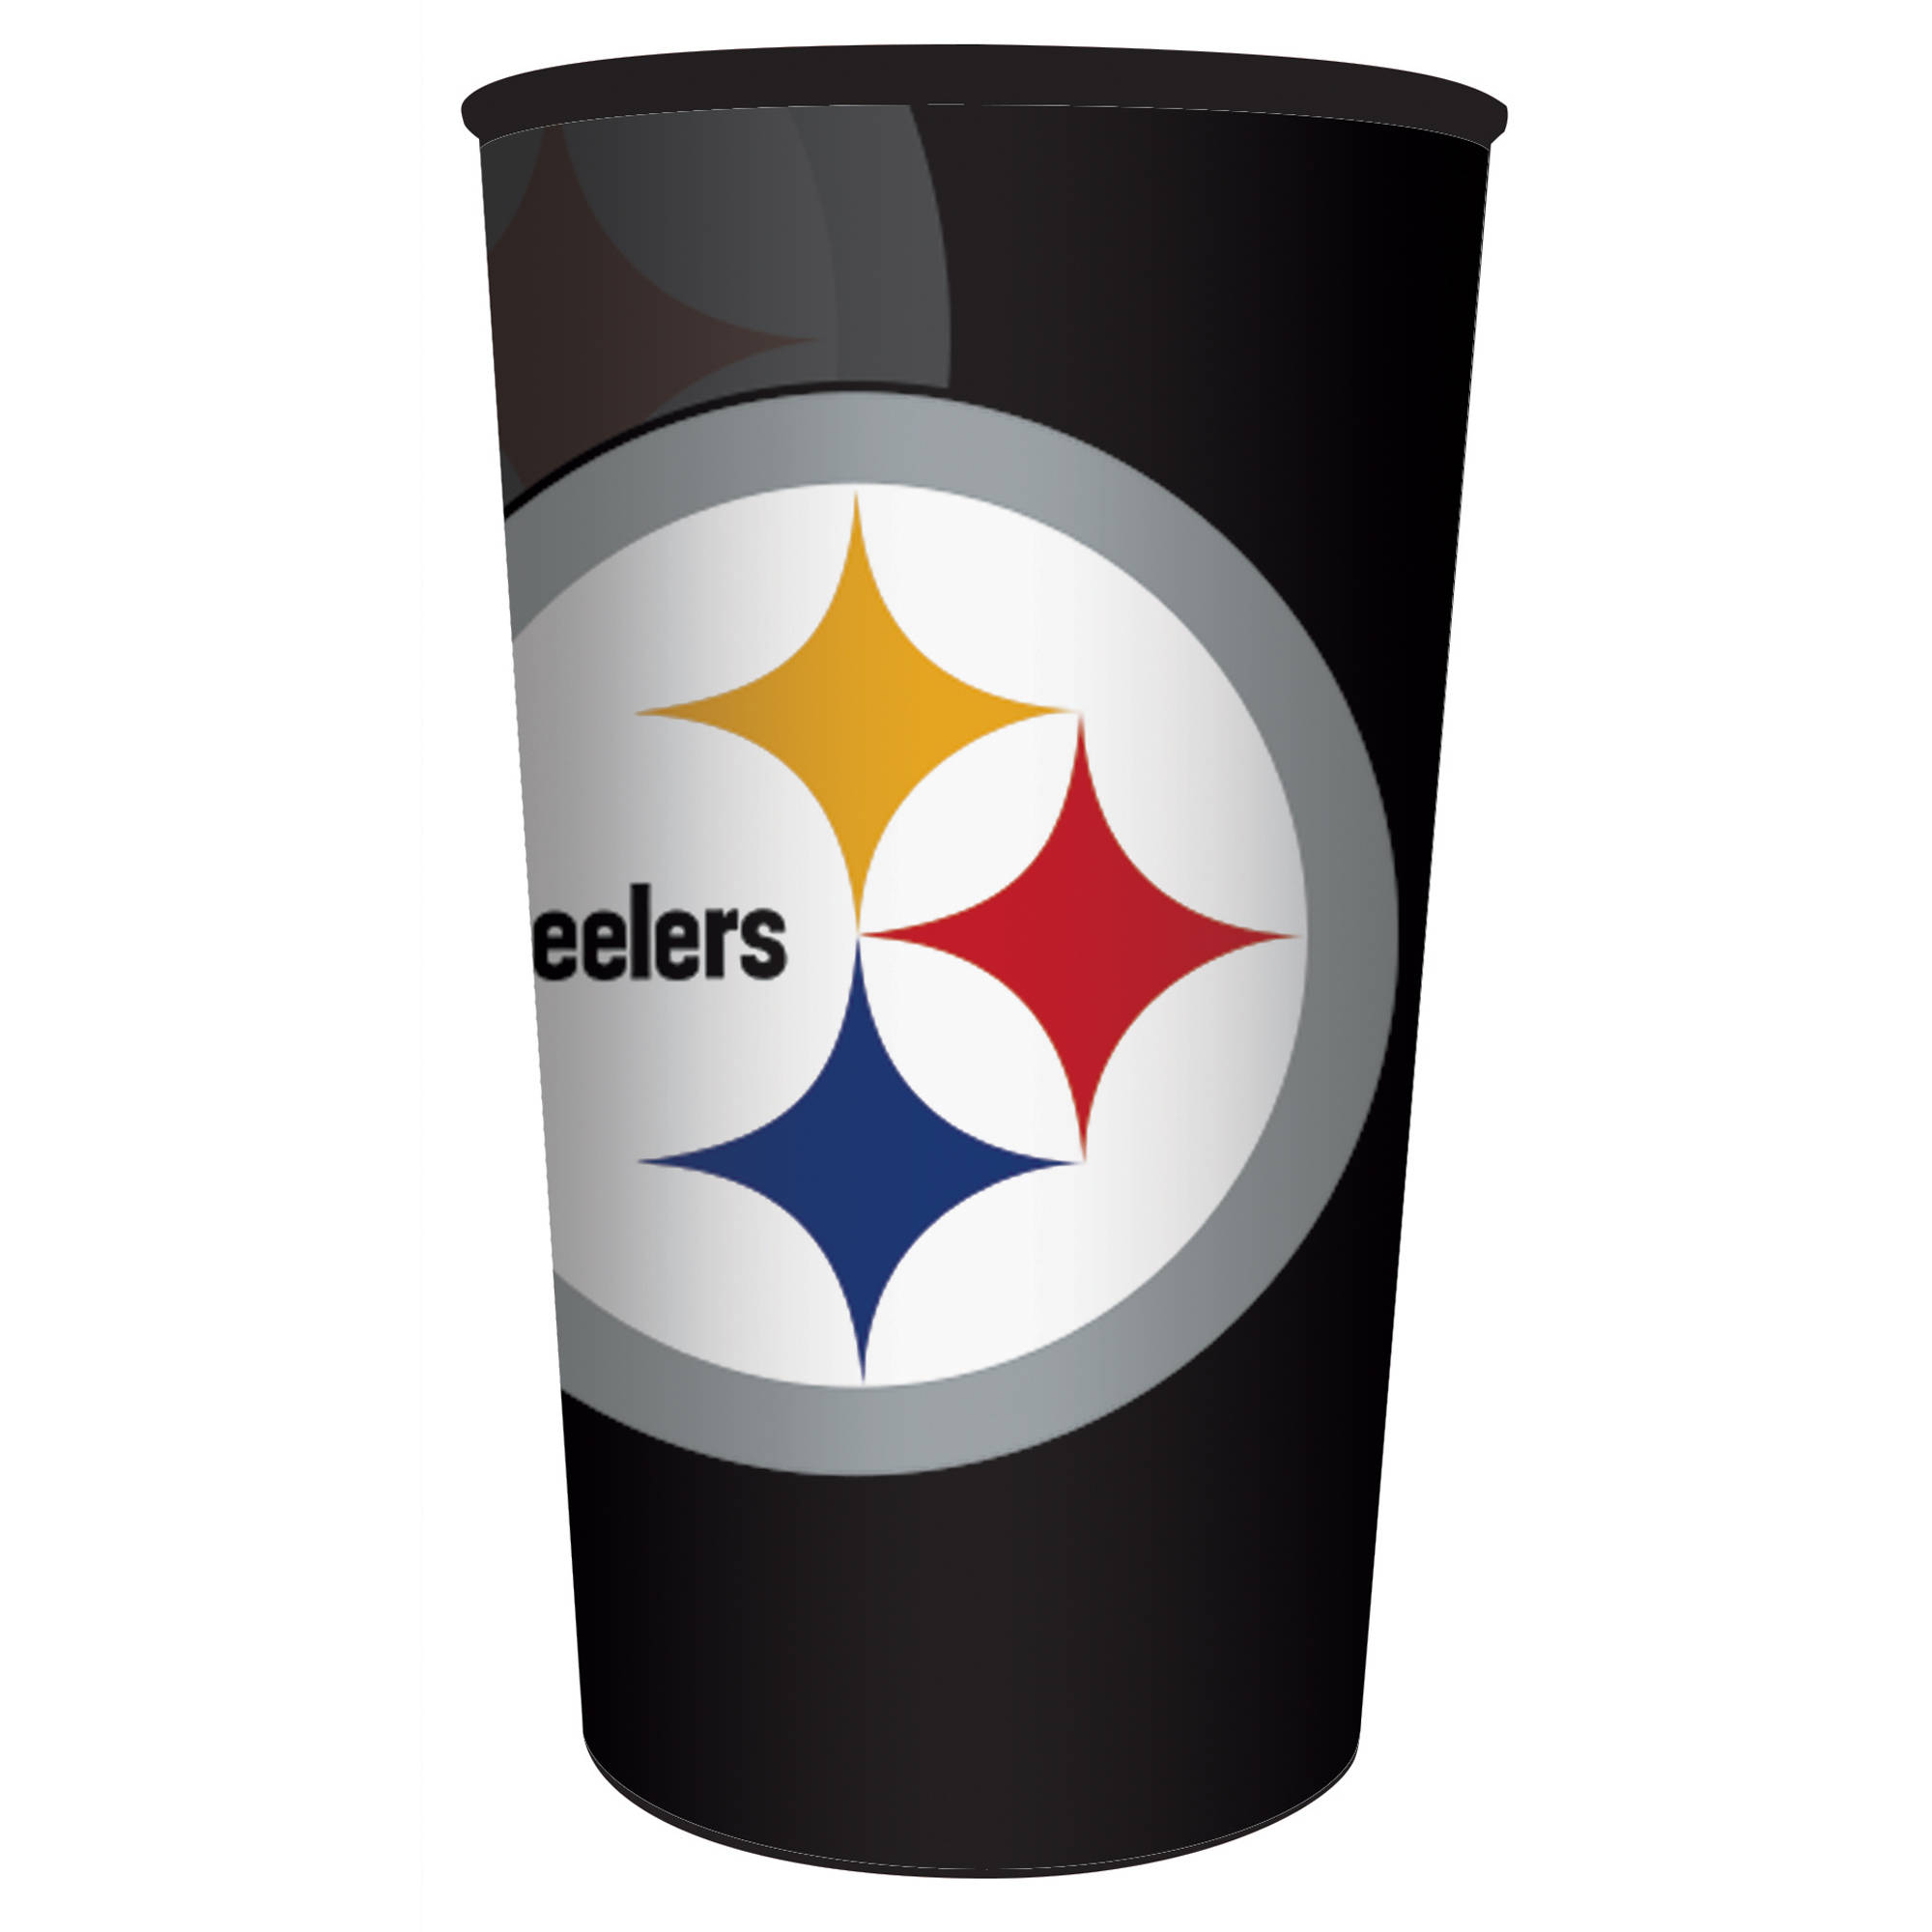 Pittsburgh Steelers Souvenir Cup   Walmart.com